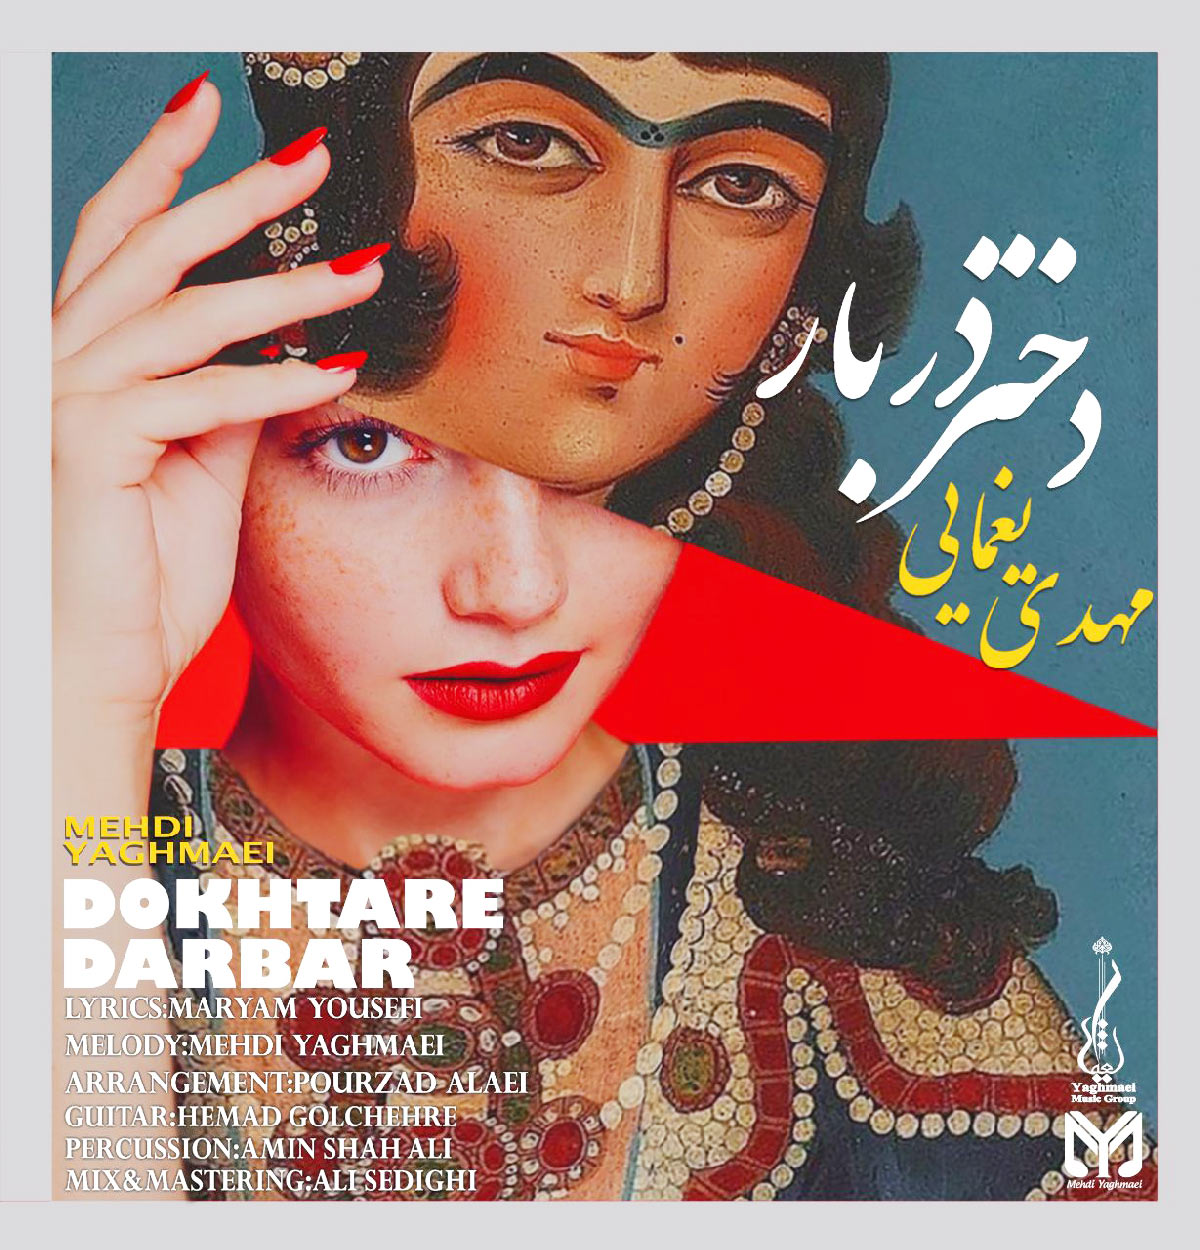 mehdiyaghmaei_dokhtare-darbar1